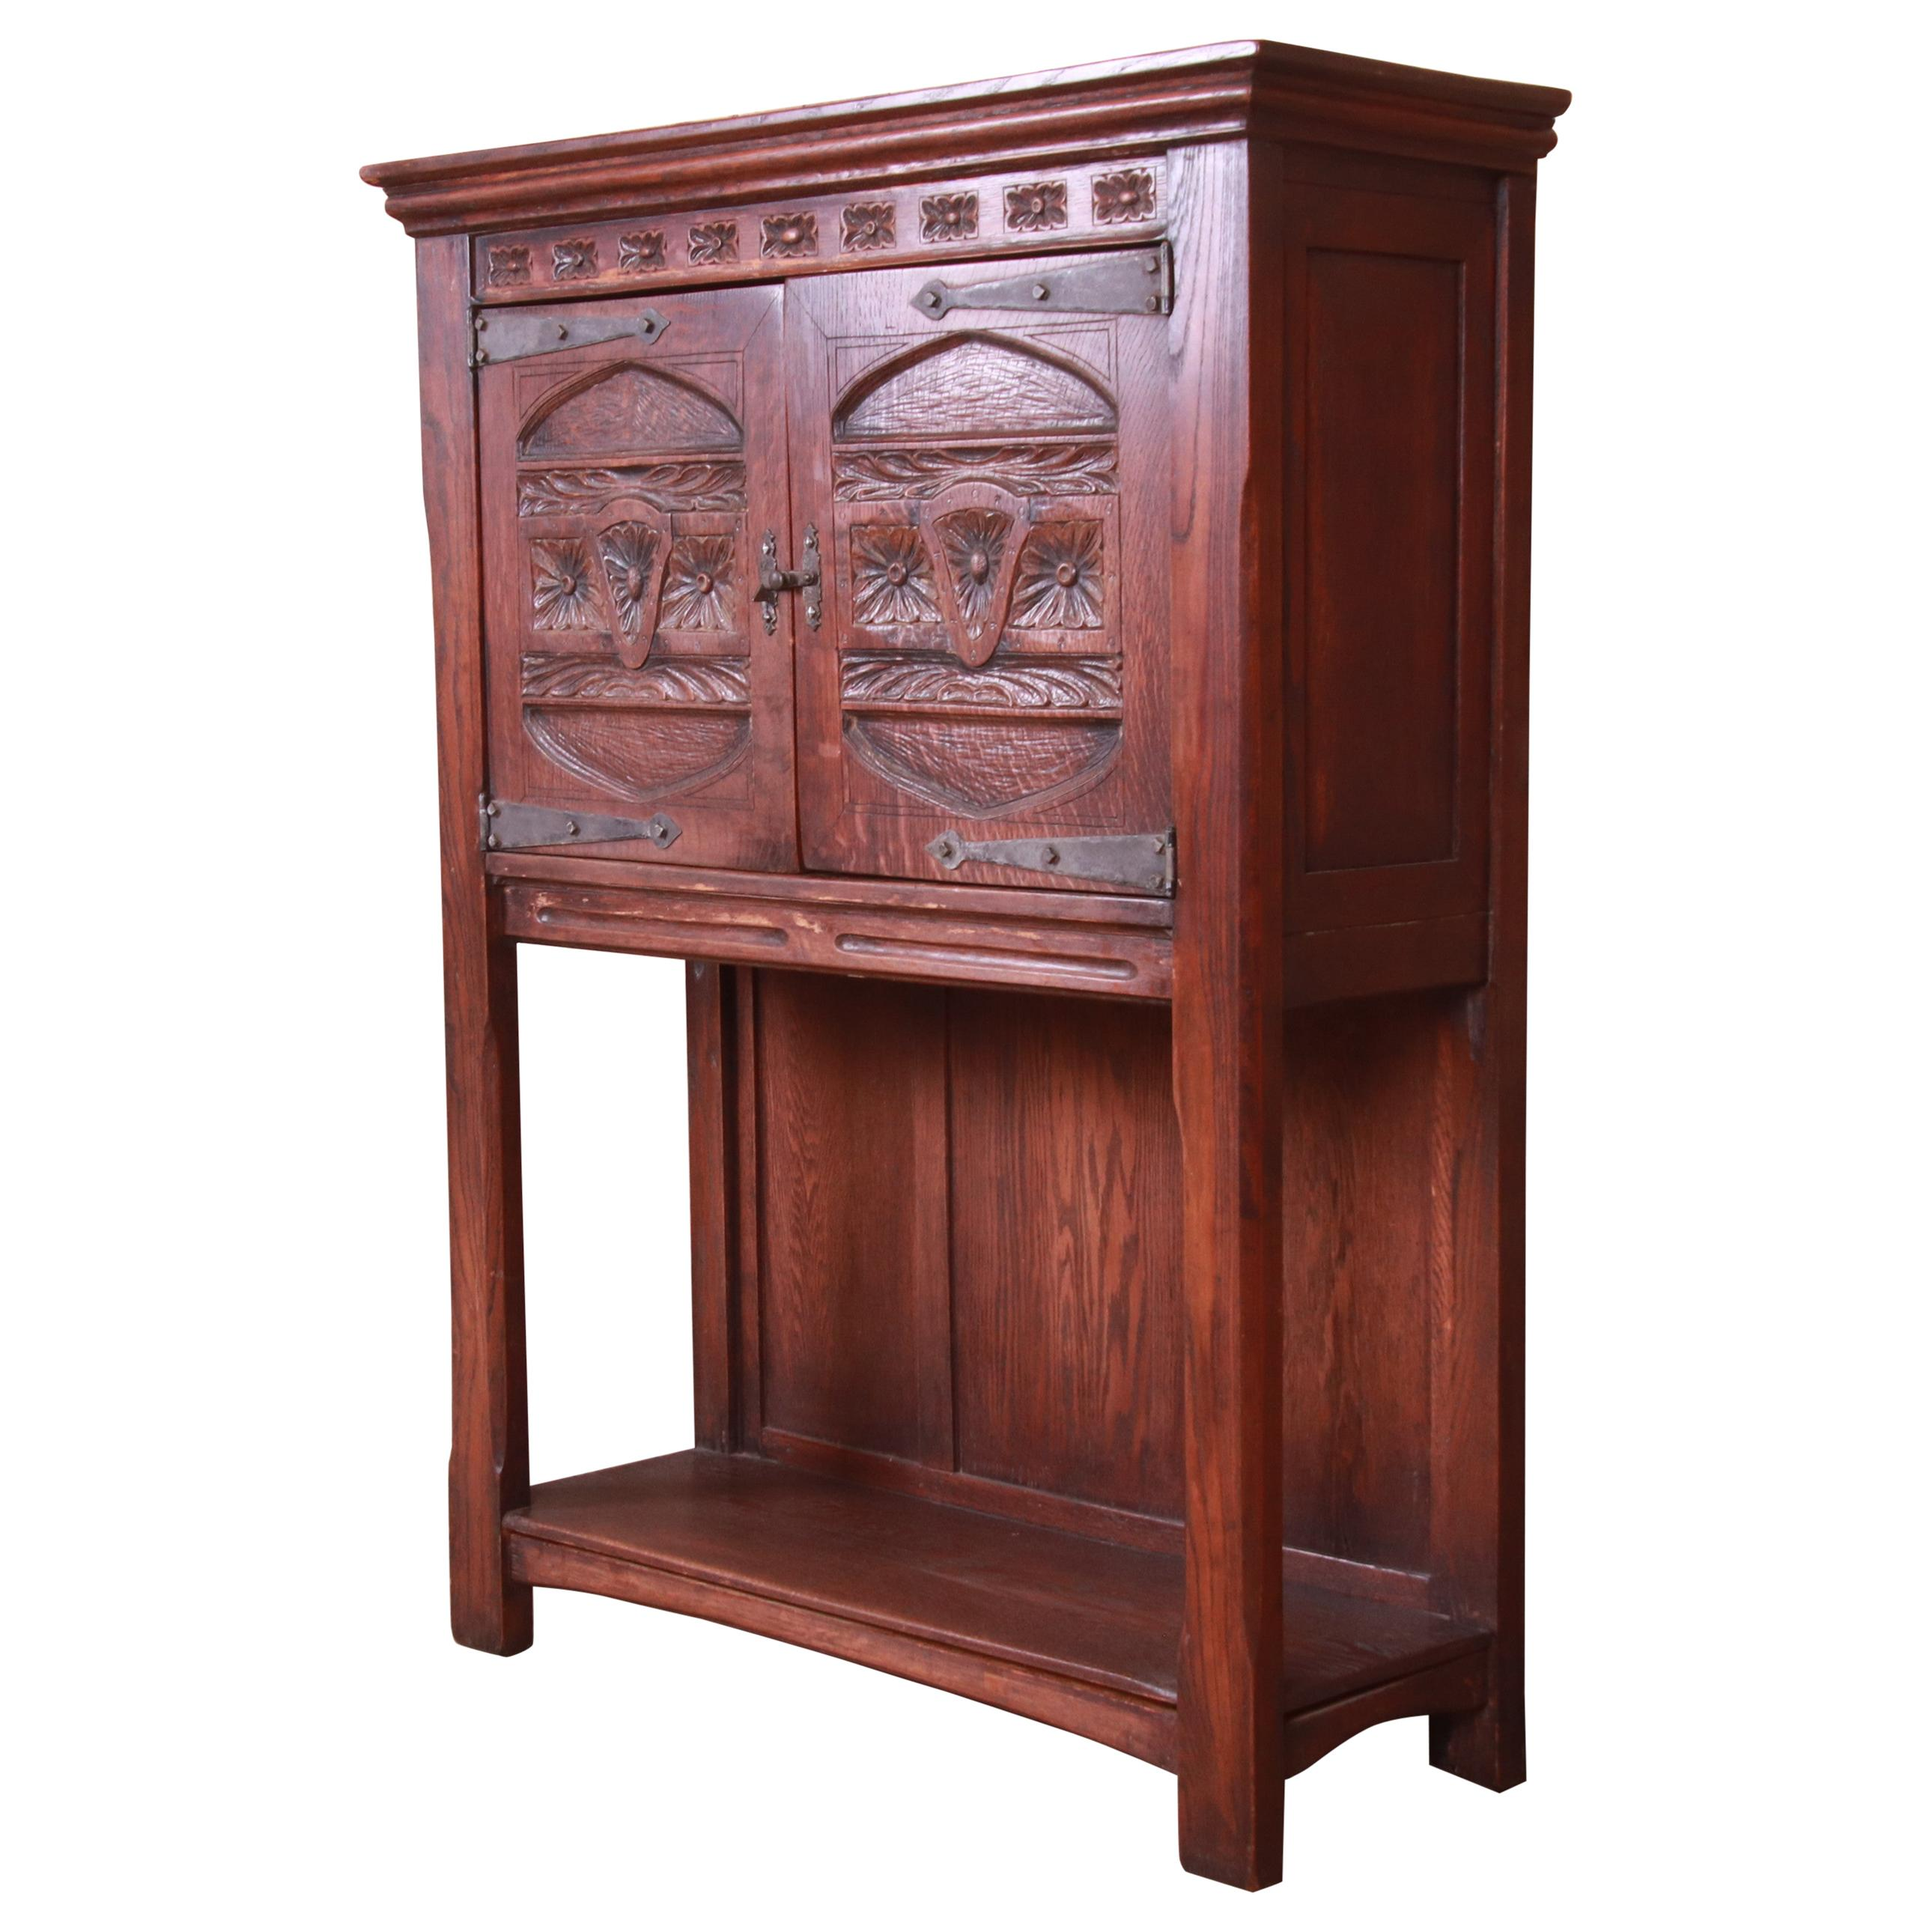 19th Century Rustic European Carved Oak Bar Cabinet